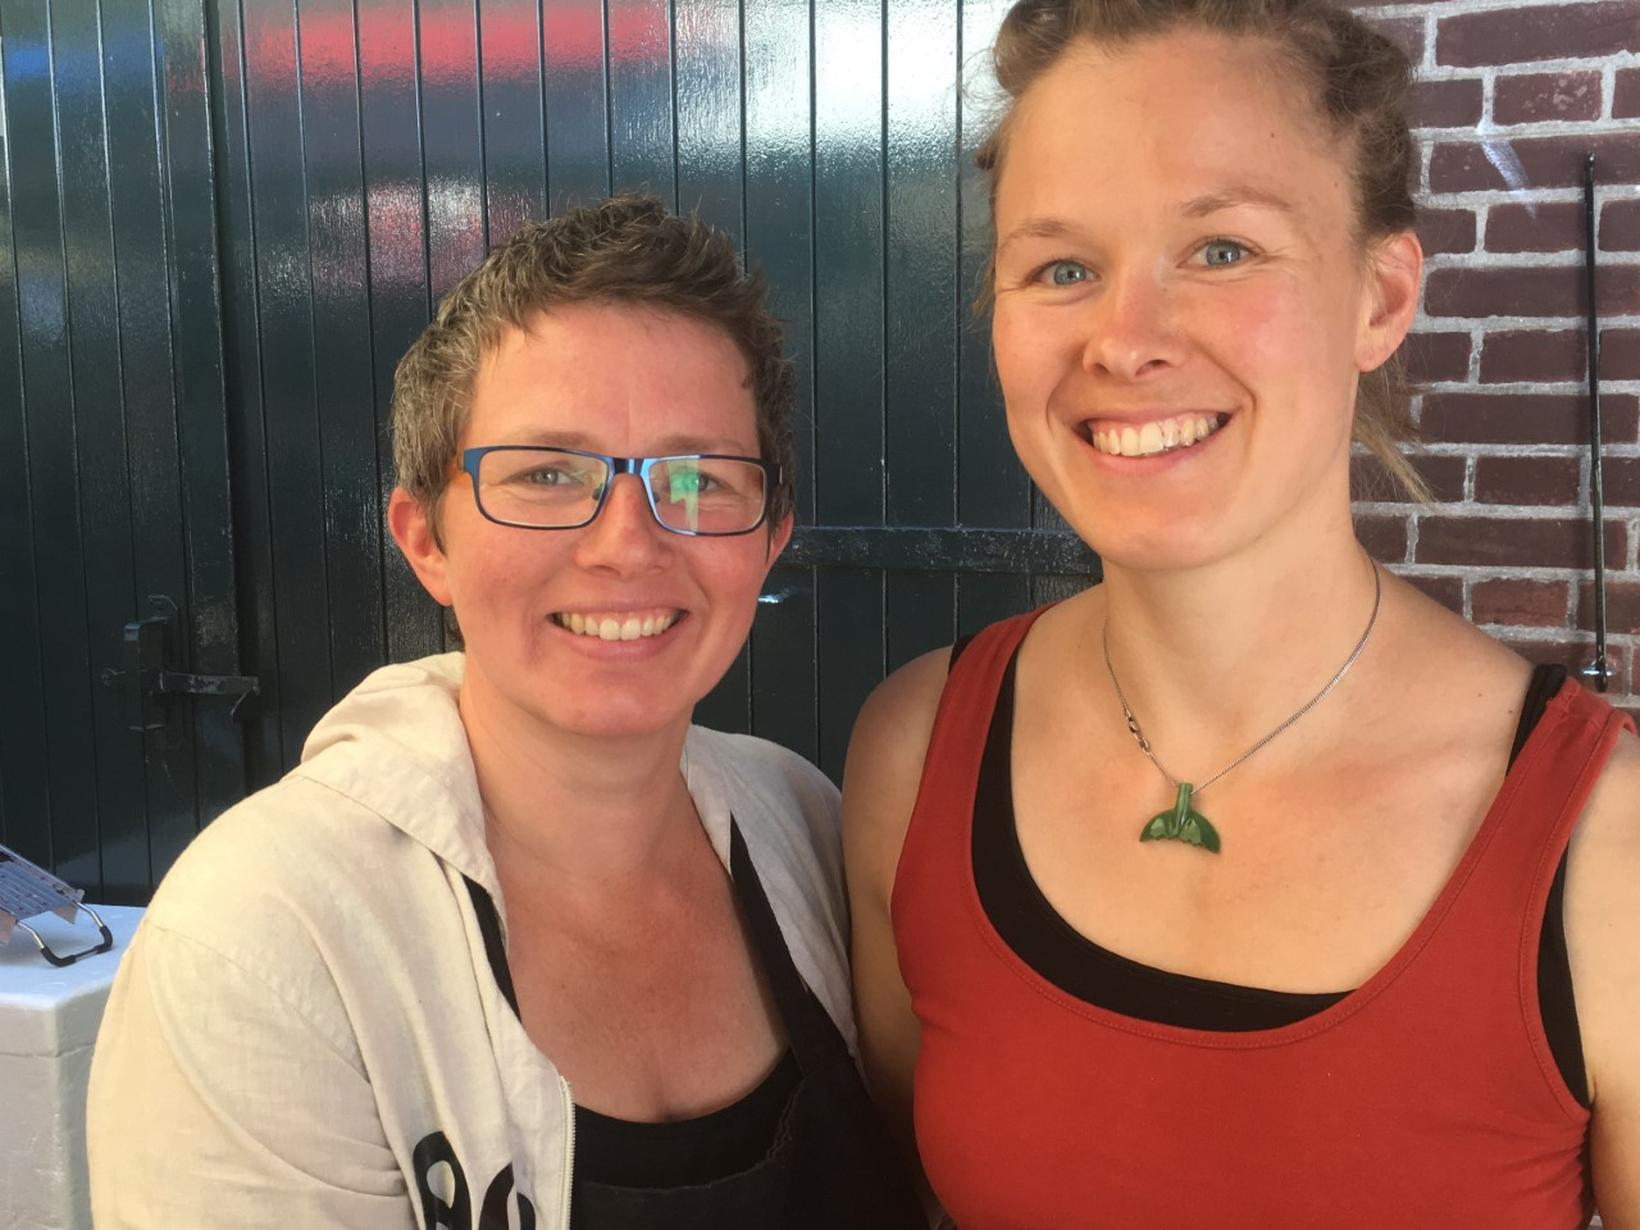 Danielle & Corien from Groningen, Netherlands